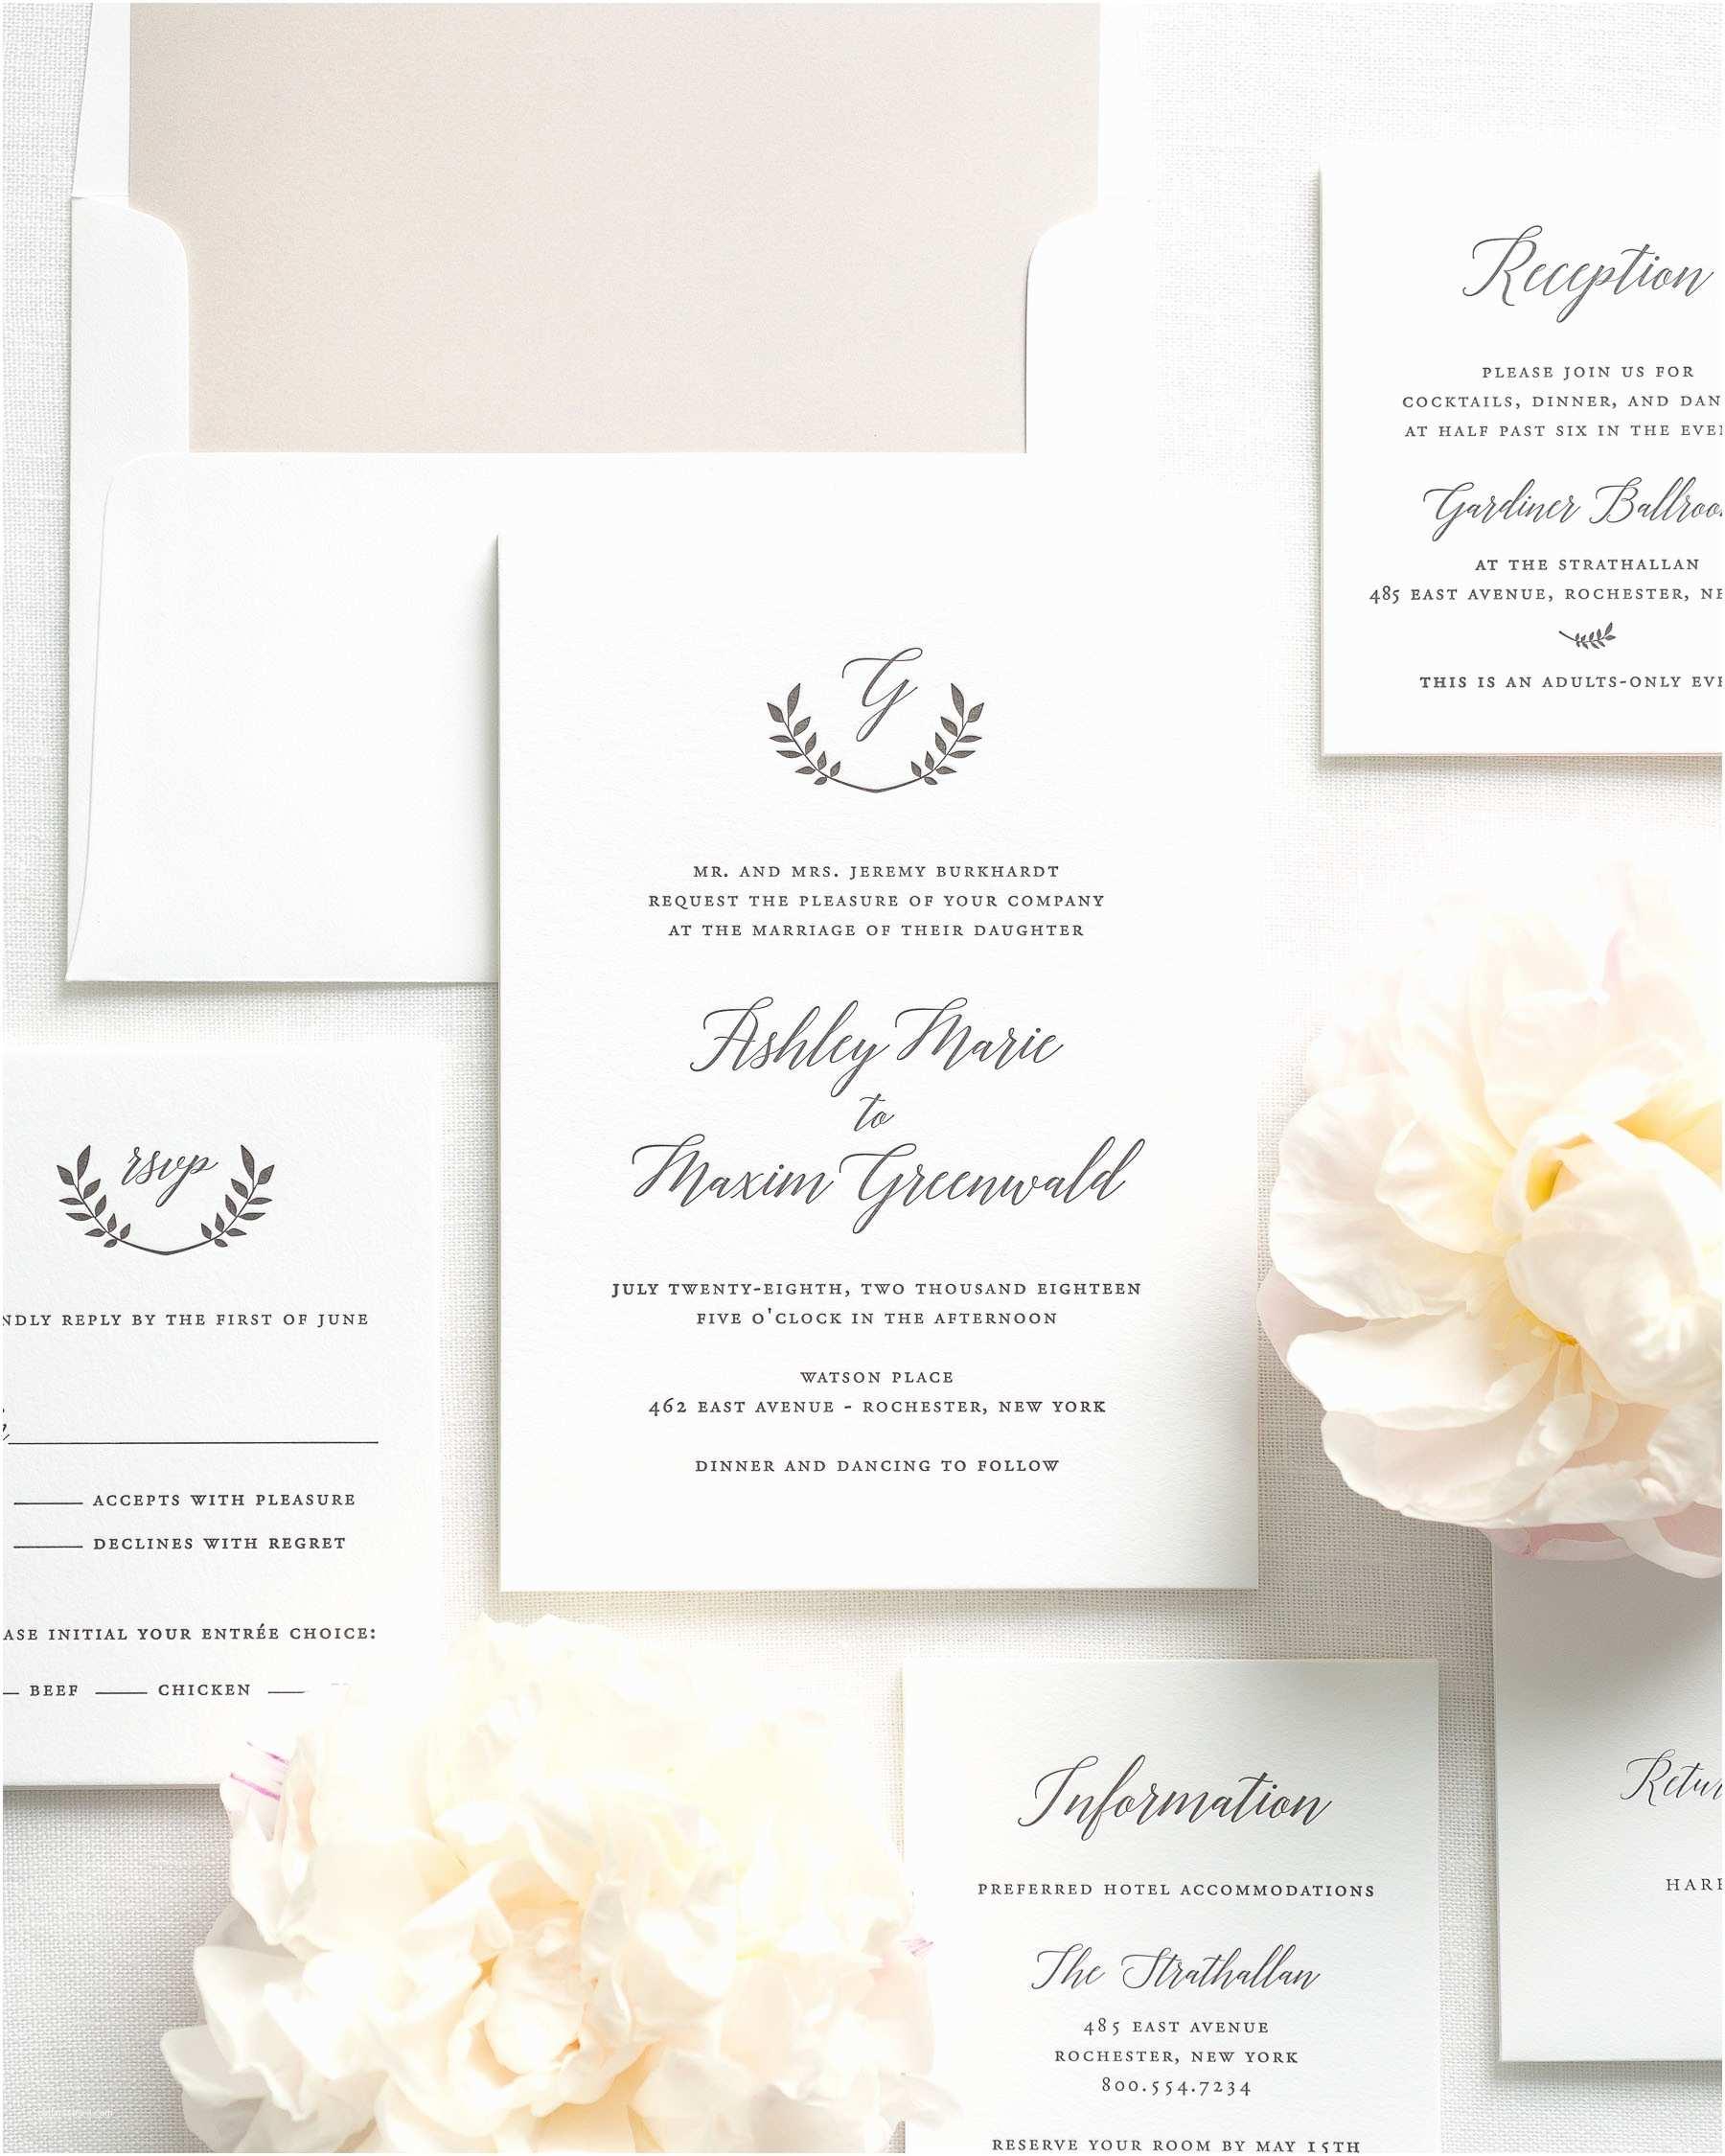 Letterpress Wedding Invitations Wreath Monogram Letterpress Wedding Invitations